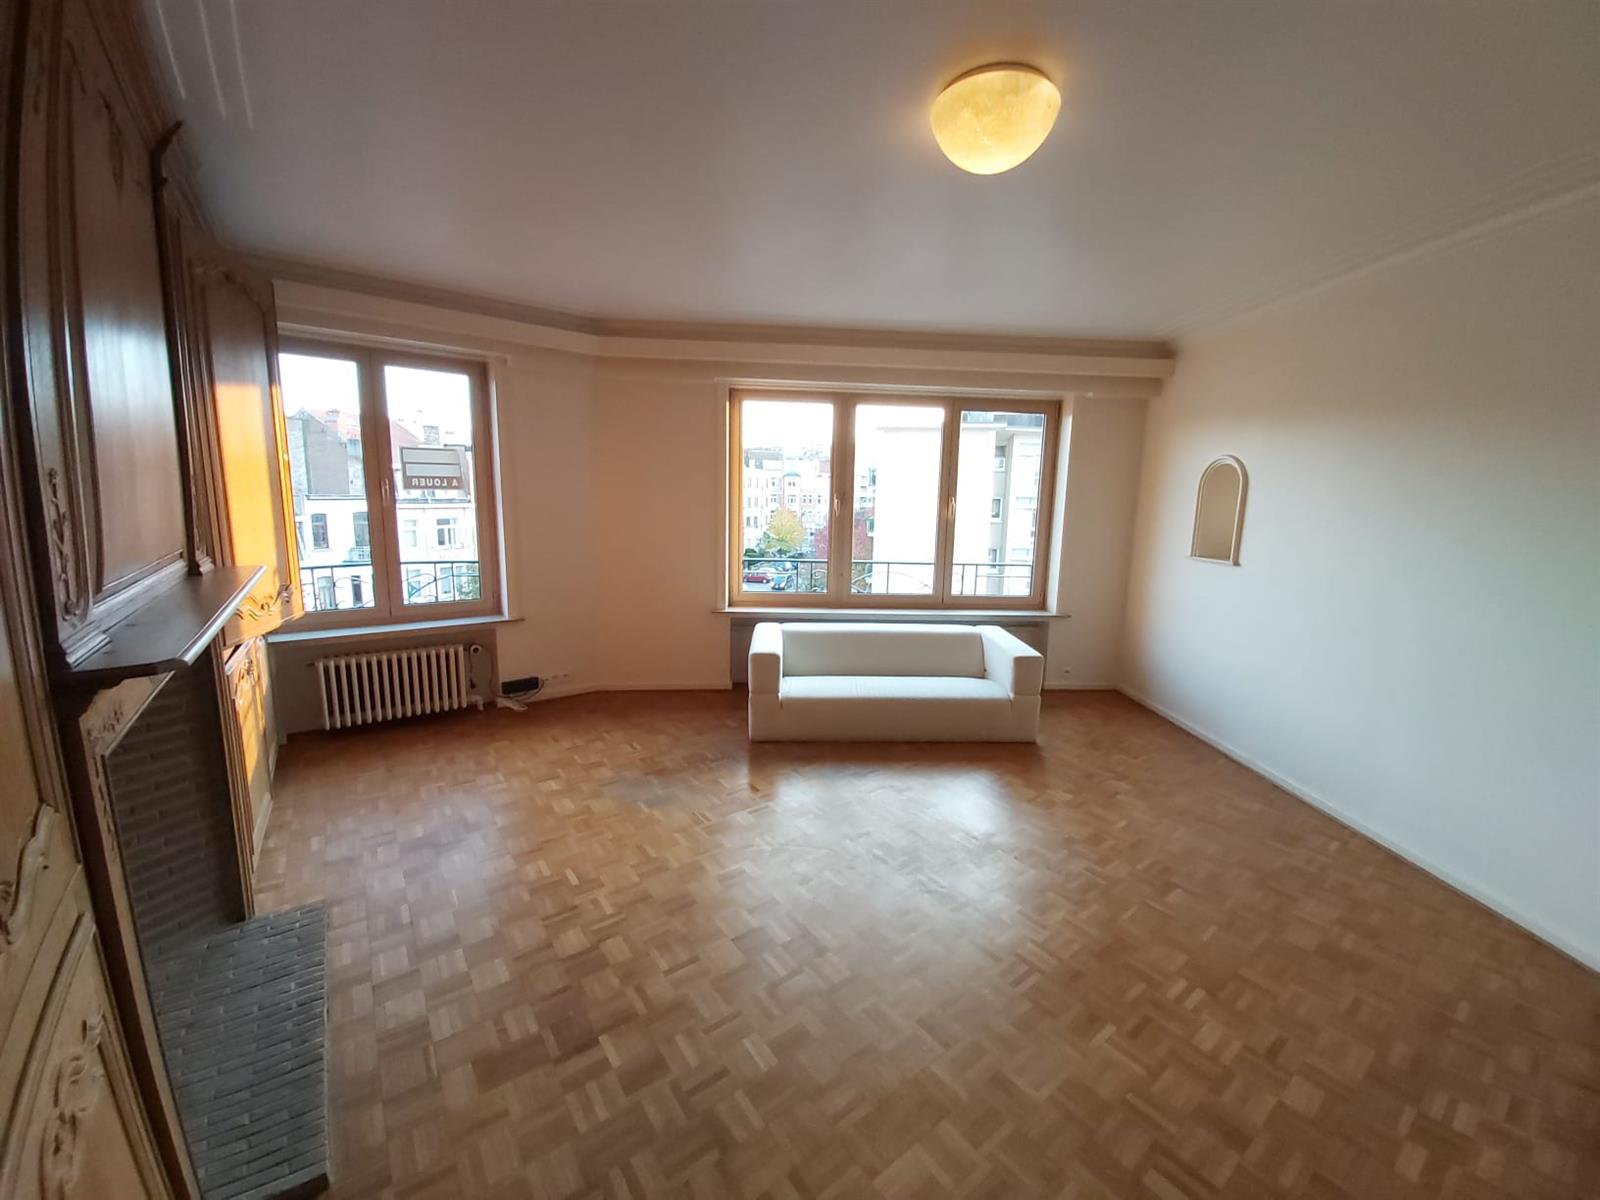 Appartement - Woluwe-Saint-Lambert - #4174735-2